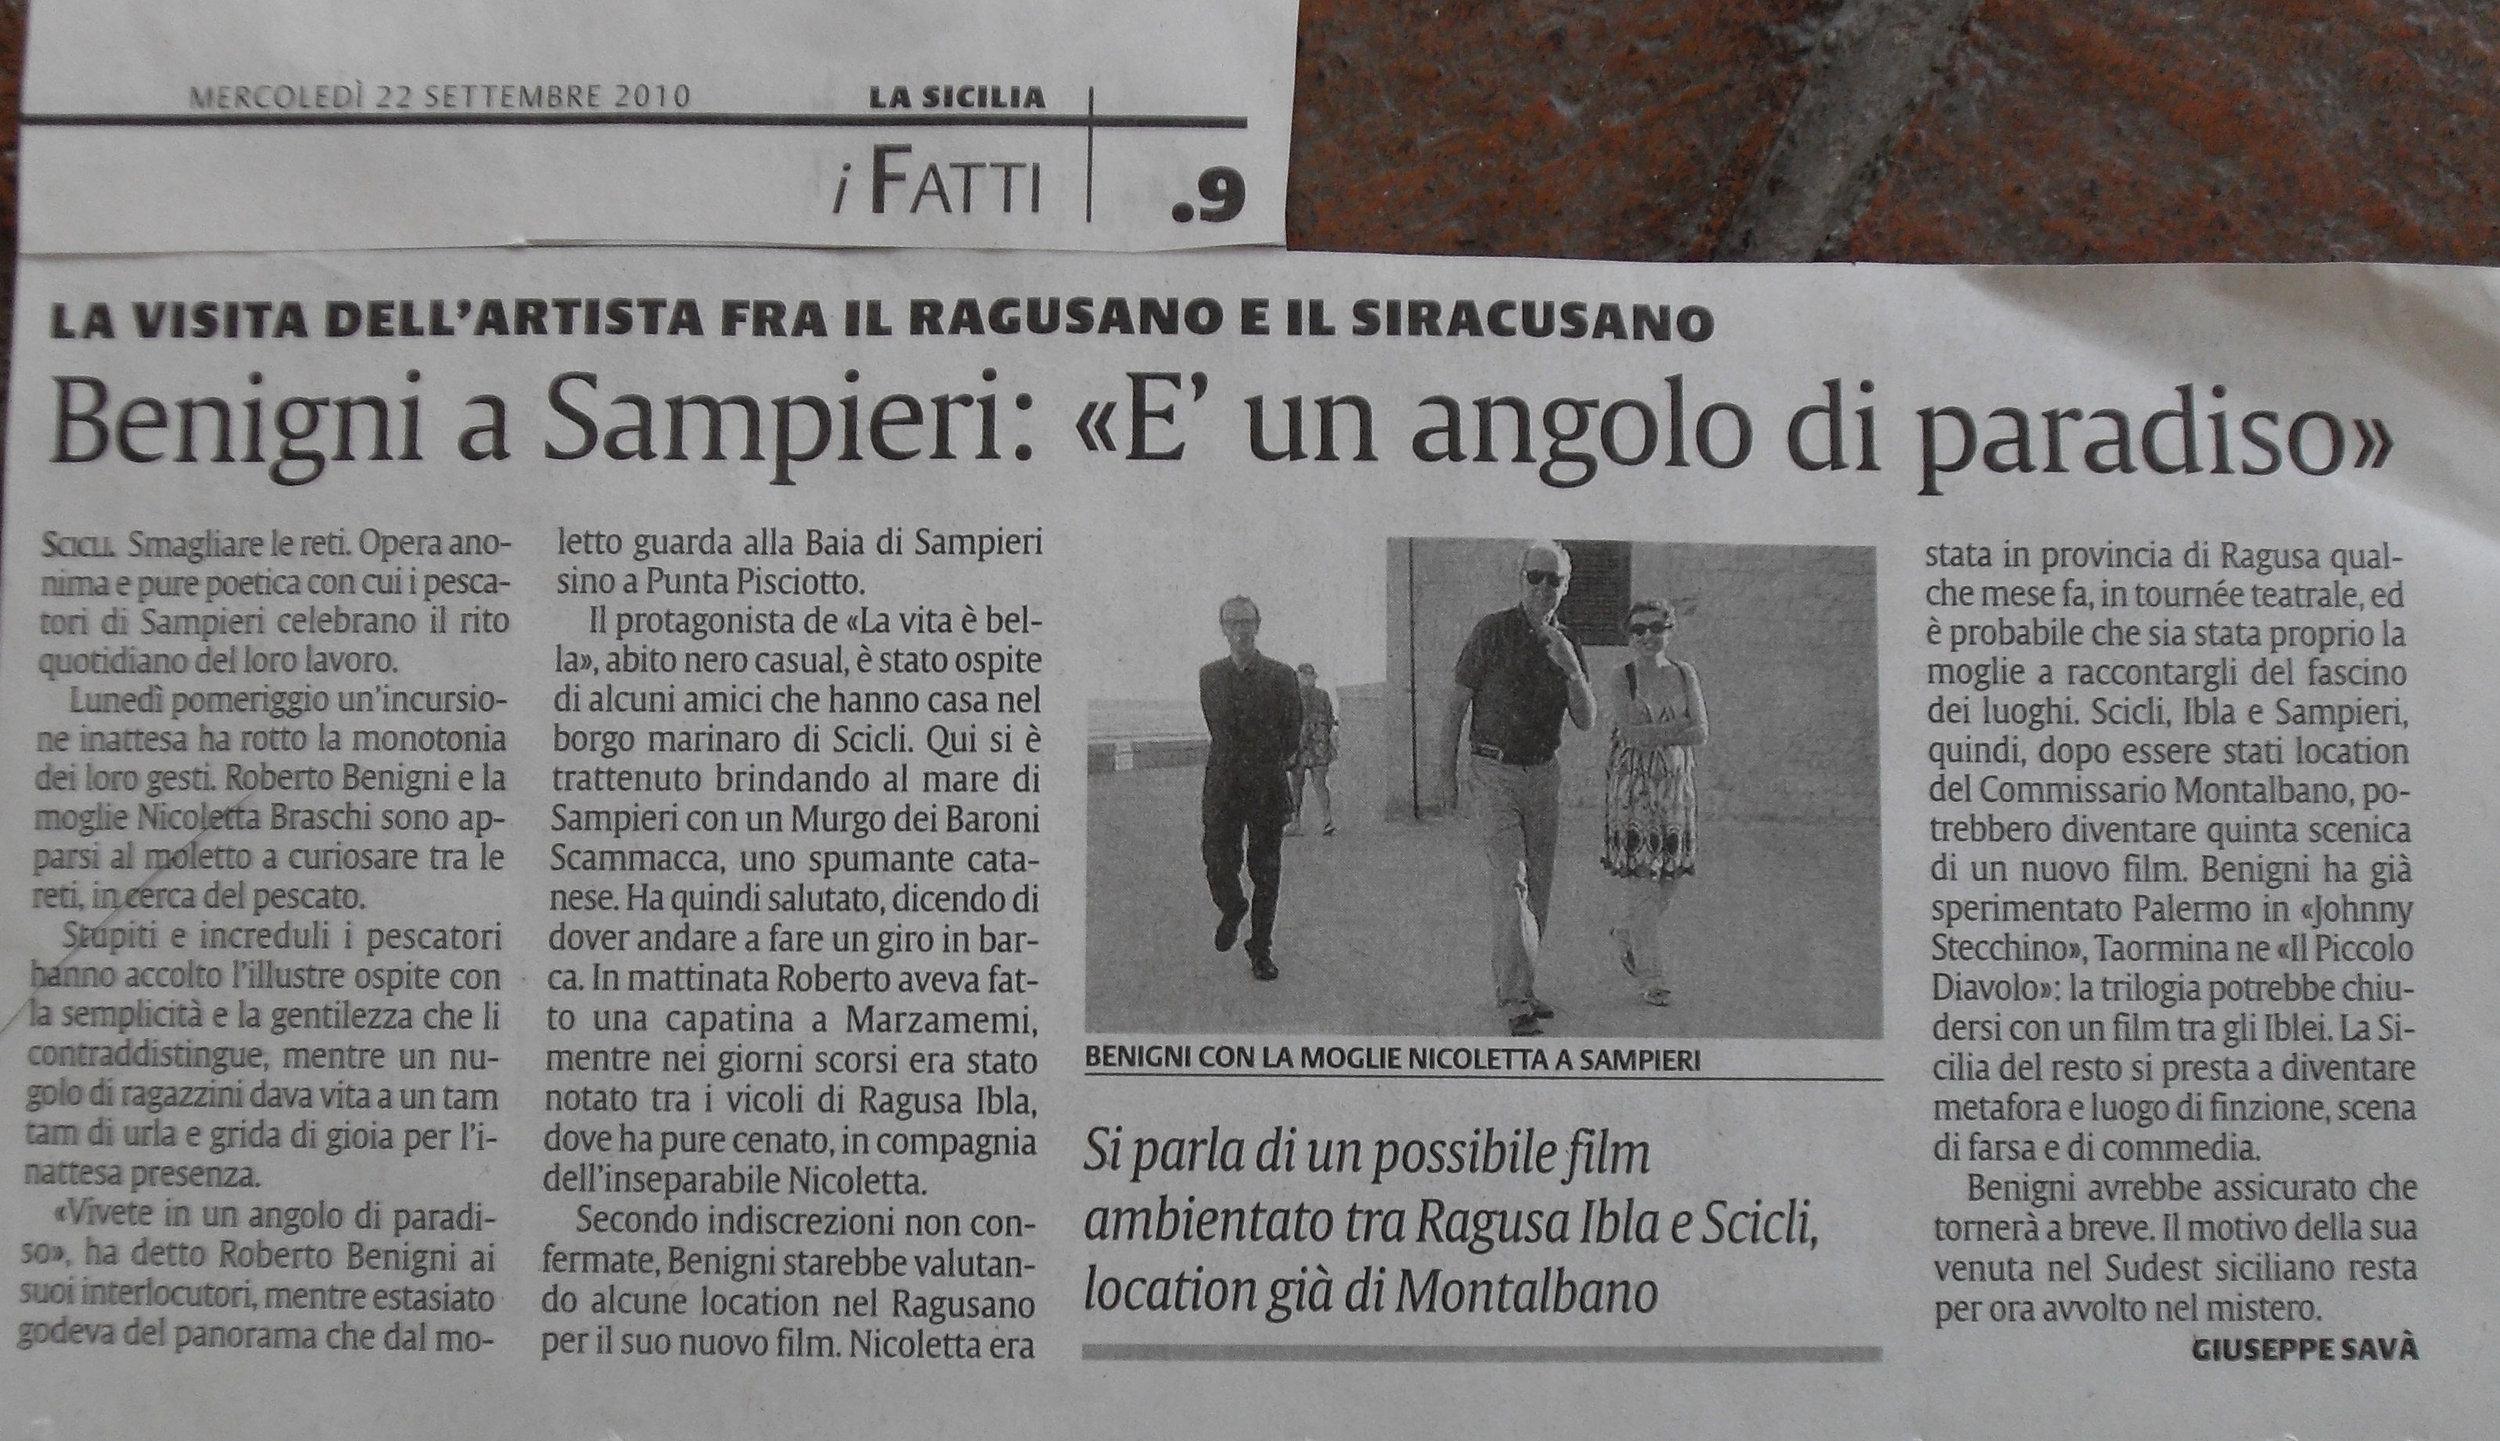 Roberto-Benigni-a-Sampieri.jpg